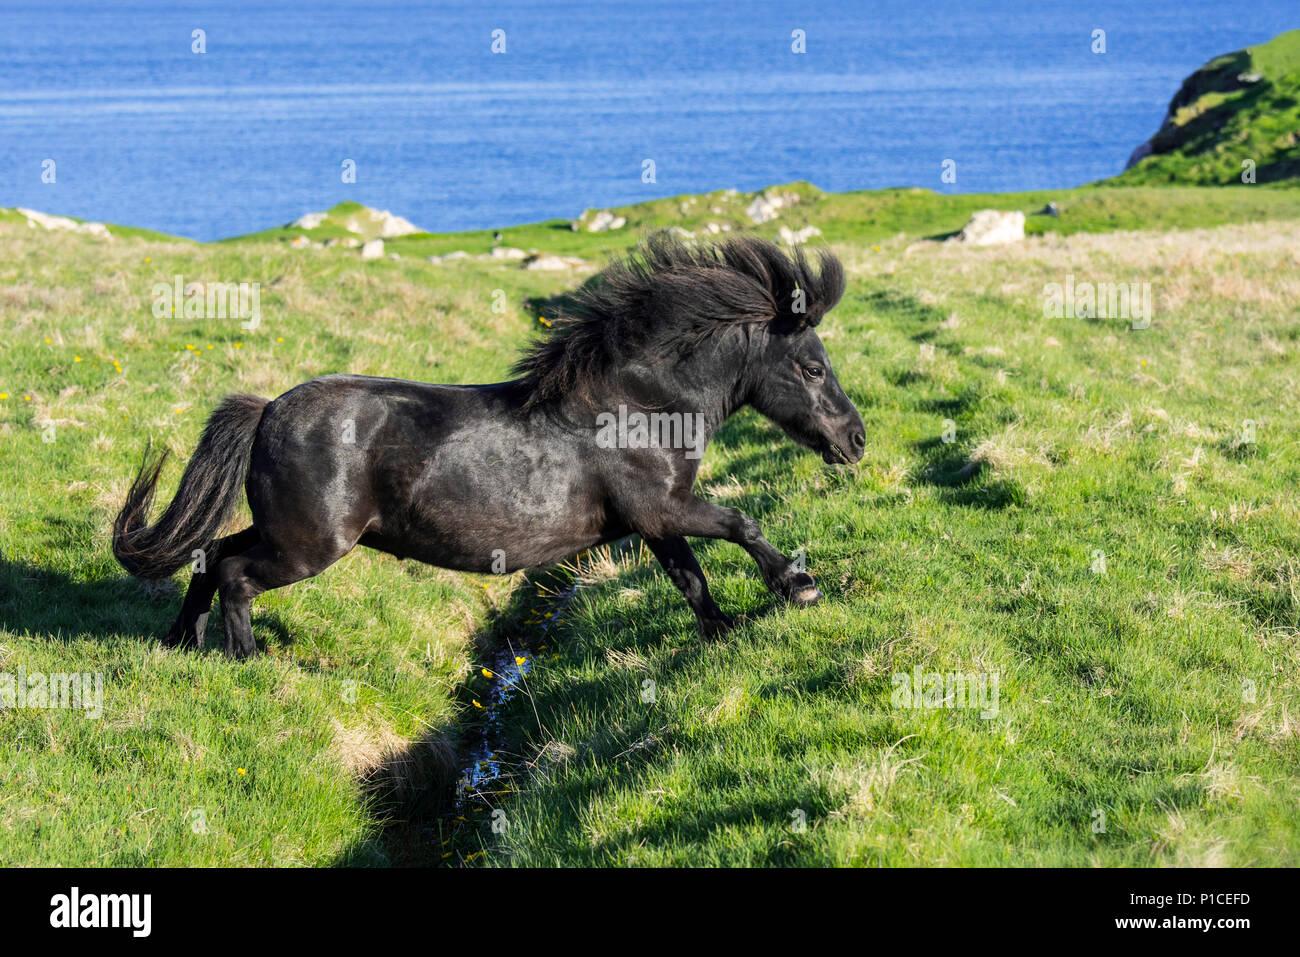 Black Shetland pony jumps over ditch in field along the coast on the Shetland Islands, Scotland, UK - Stock Image